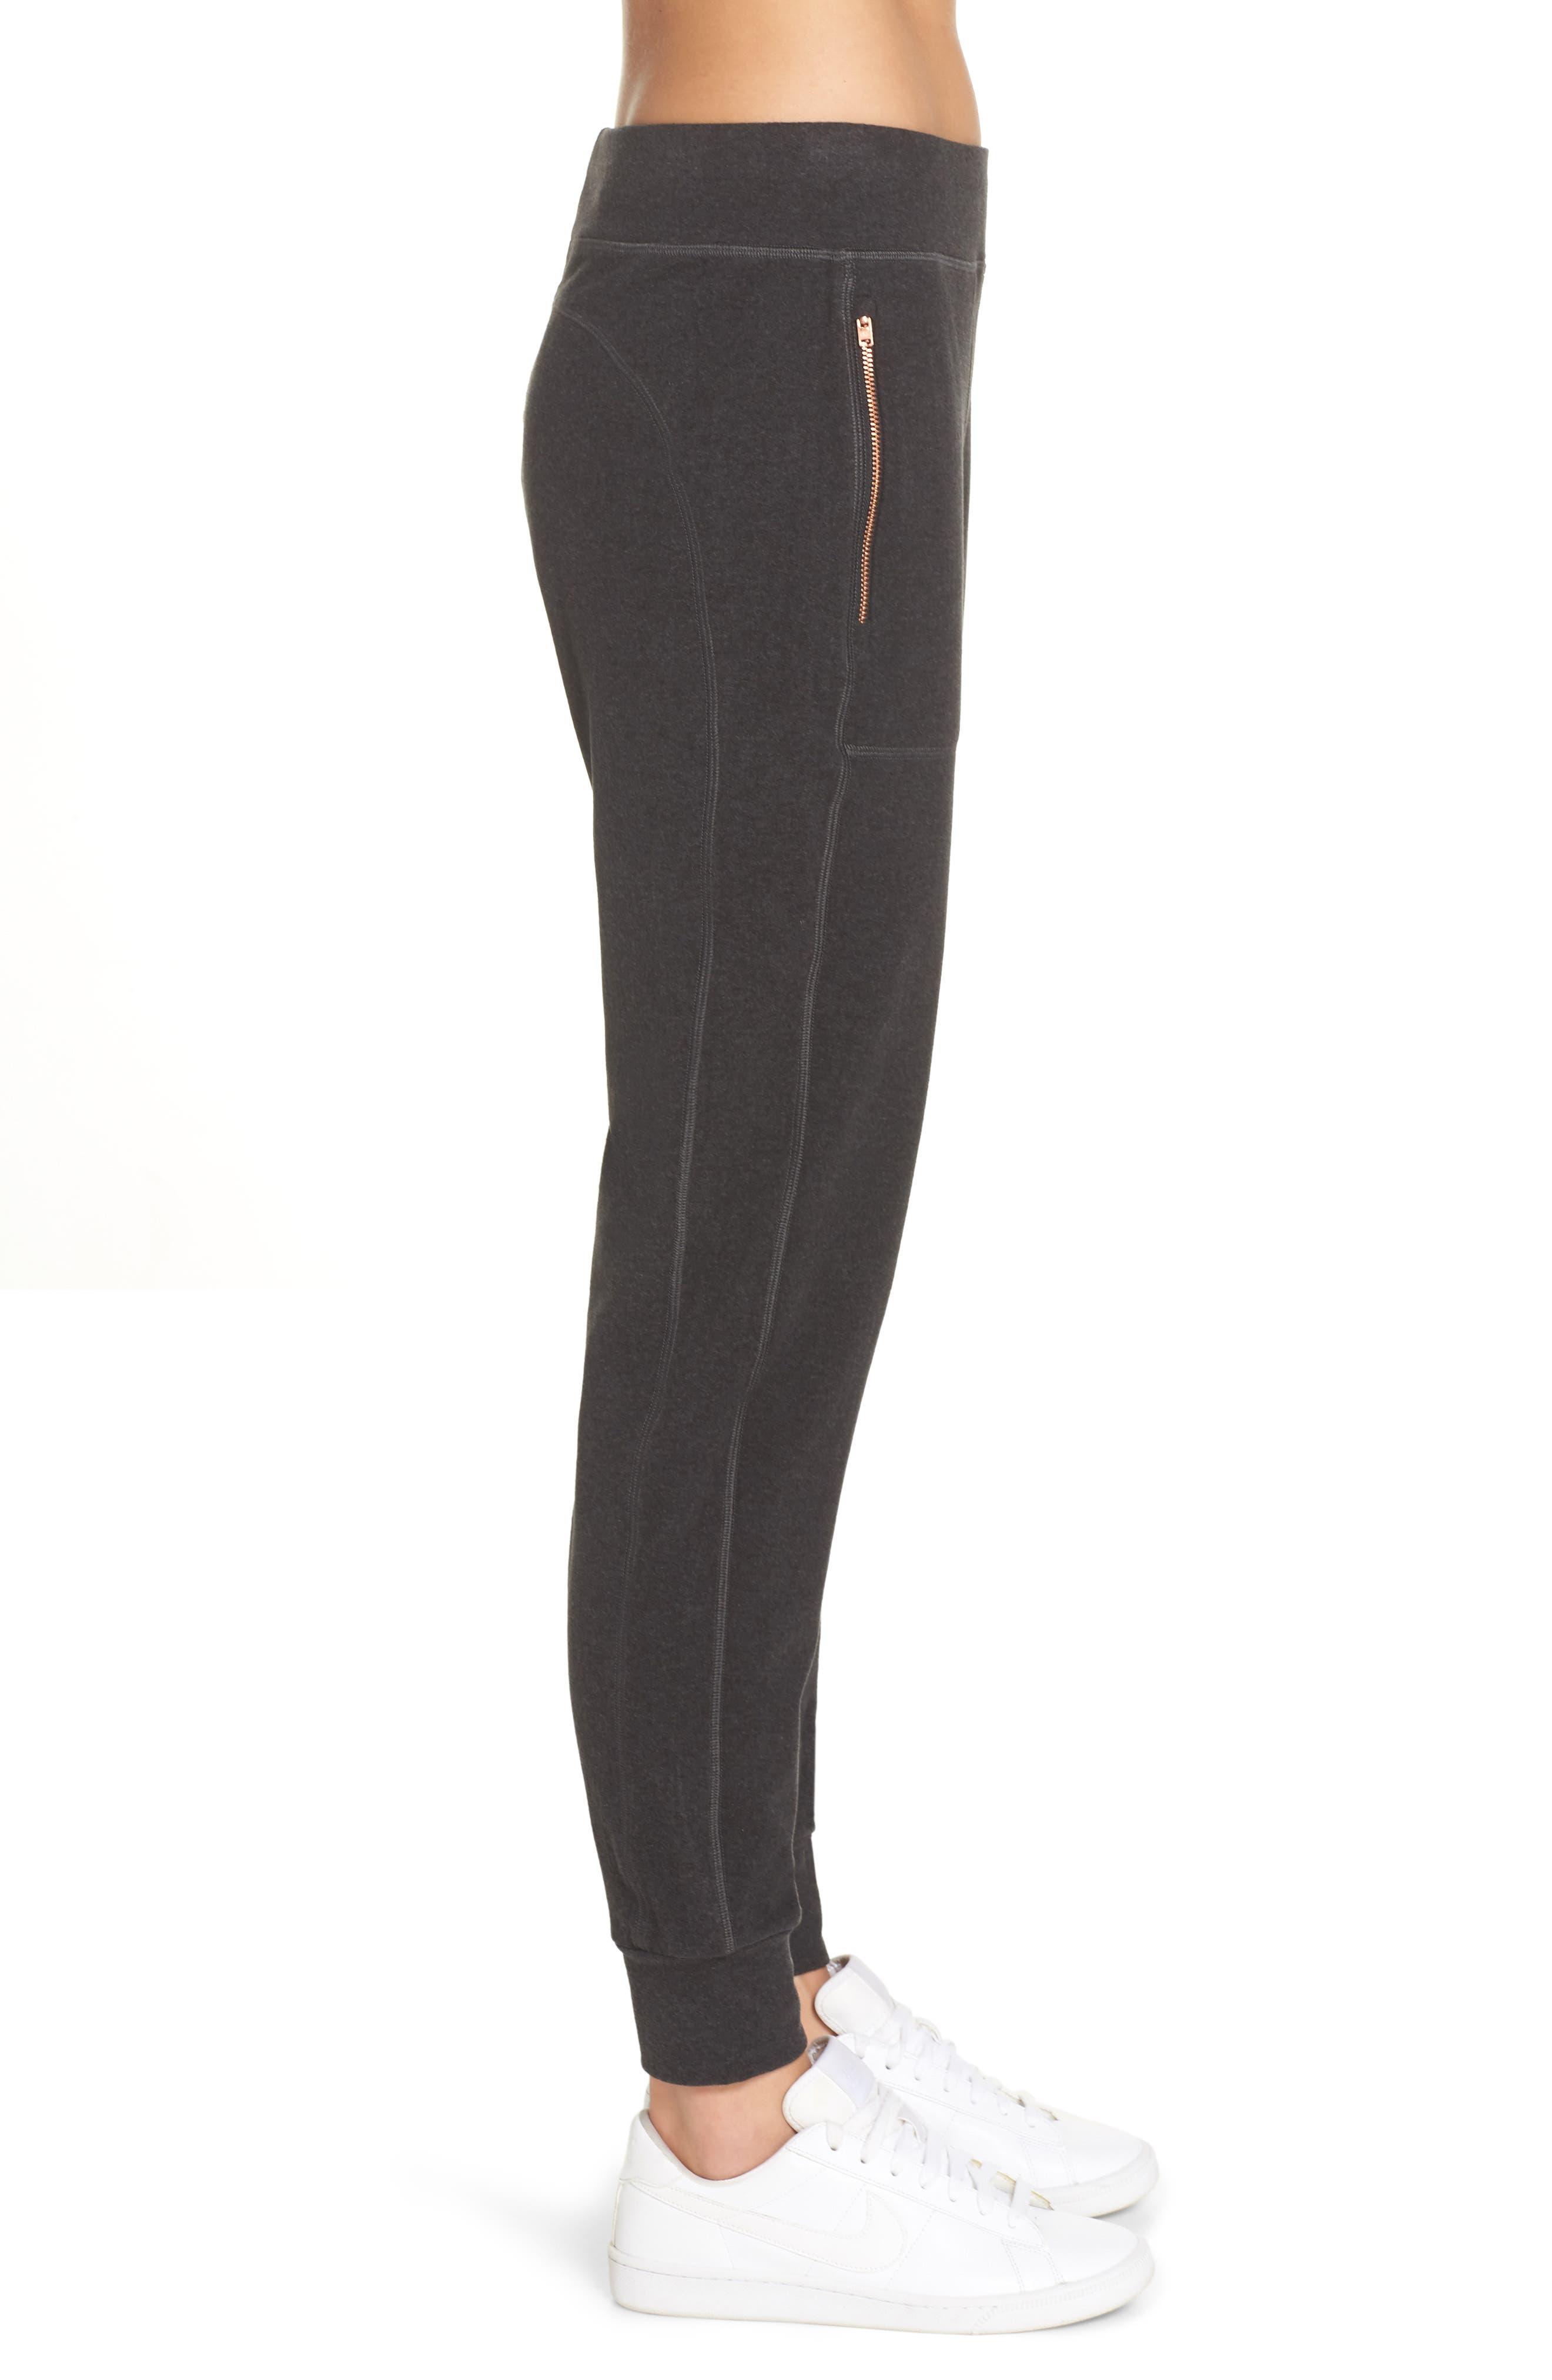 Luxe Liberty Jogger Pants,                             Alternate thumbnail 3, color,                             BLACK MARL